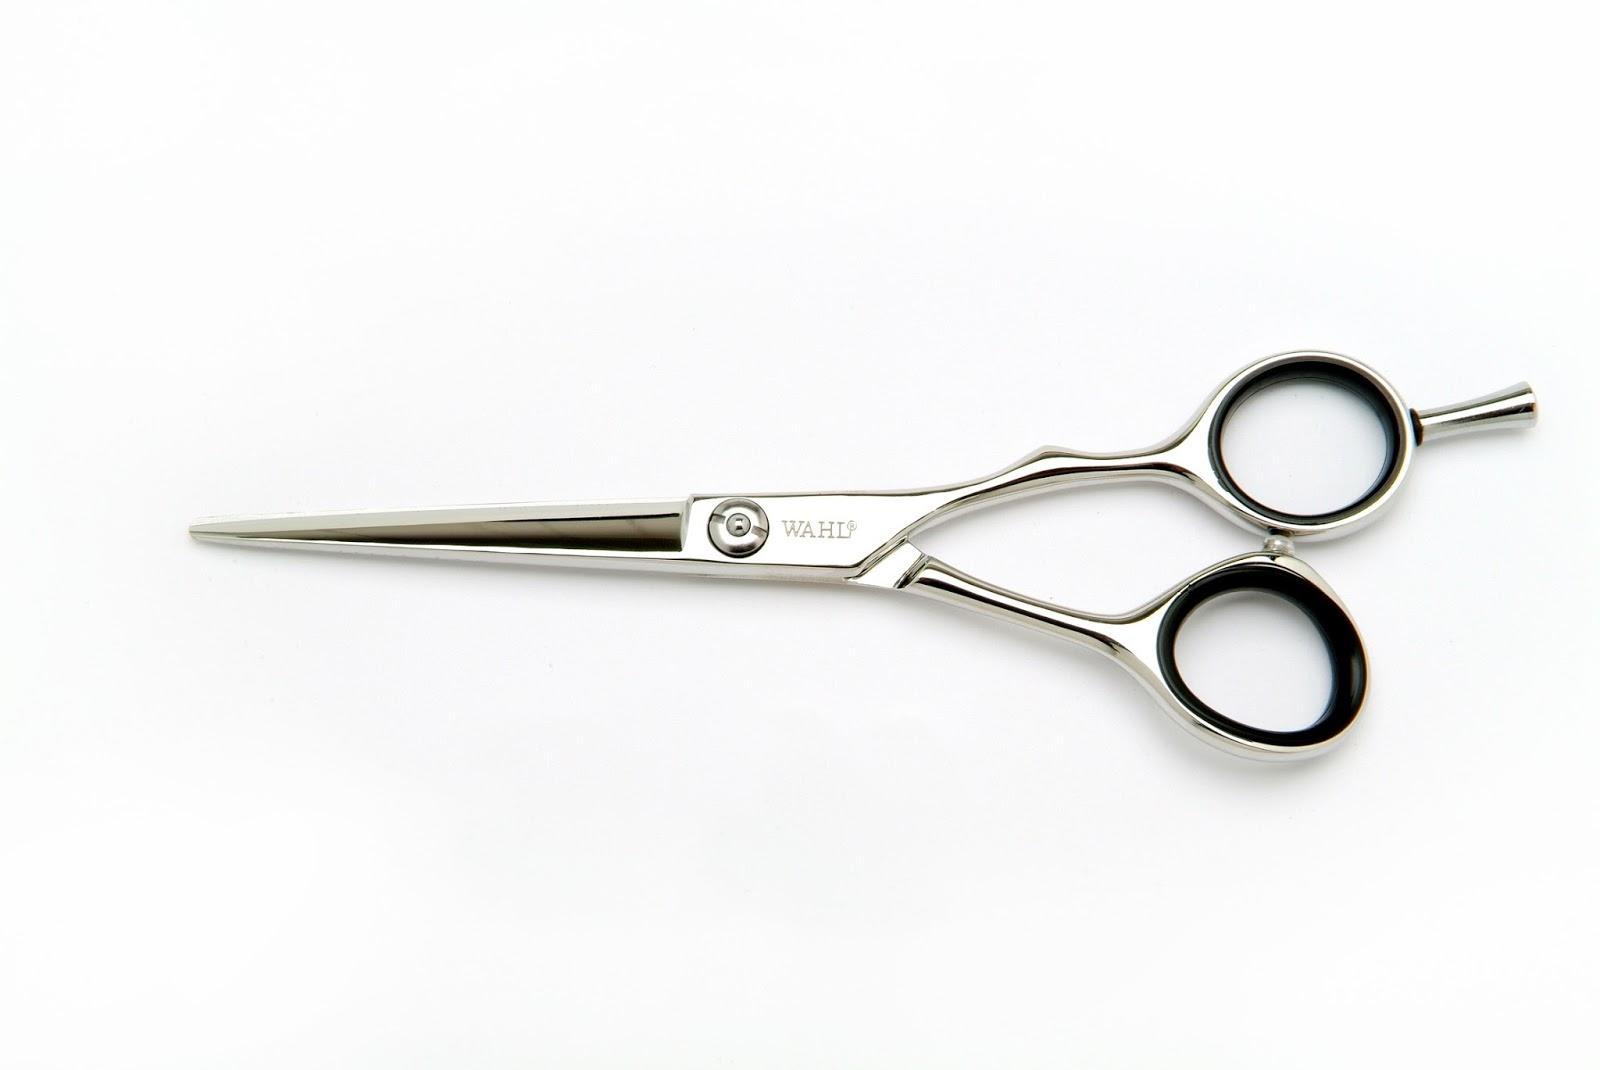 Jual Gunting Potong Rambut untuk Usaha Pangkas Rambut  8739bff764